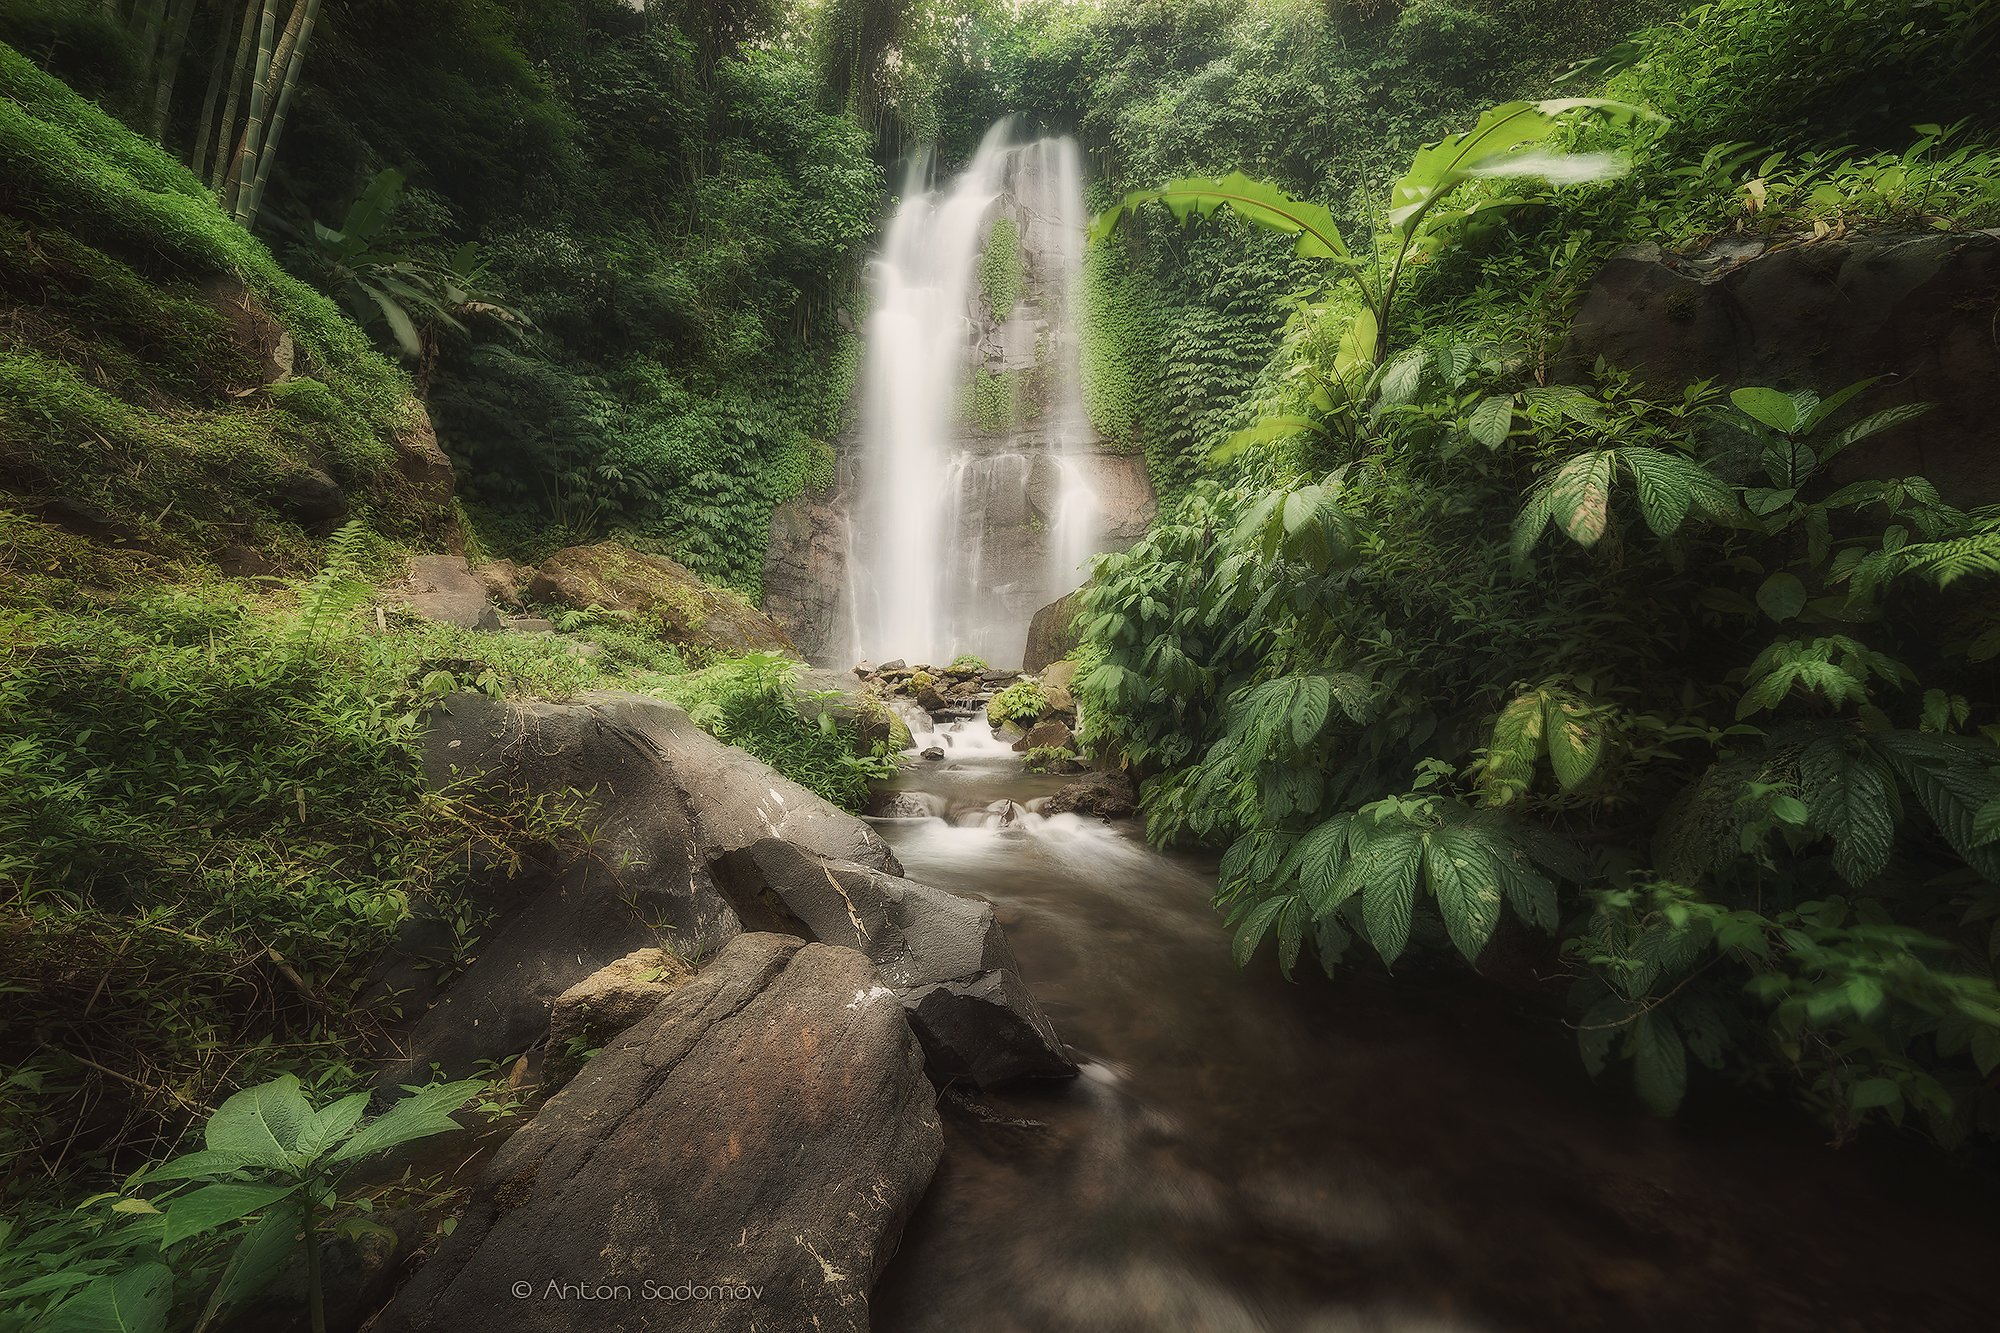 индонезия, бали, водопад, зелень, листва, джунгли, Антон Садомов